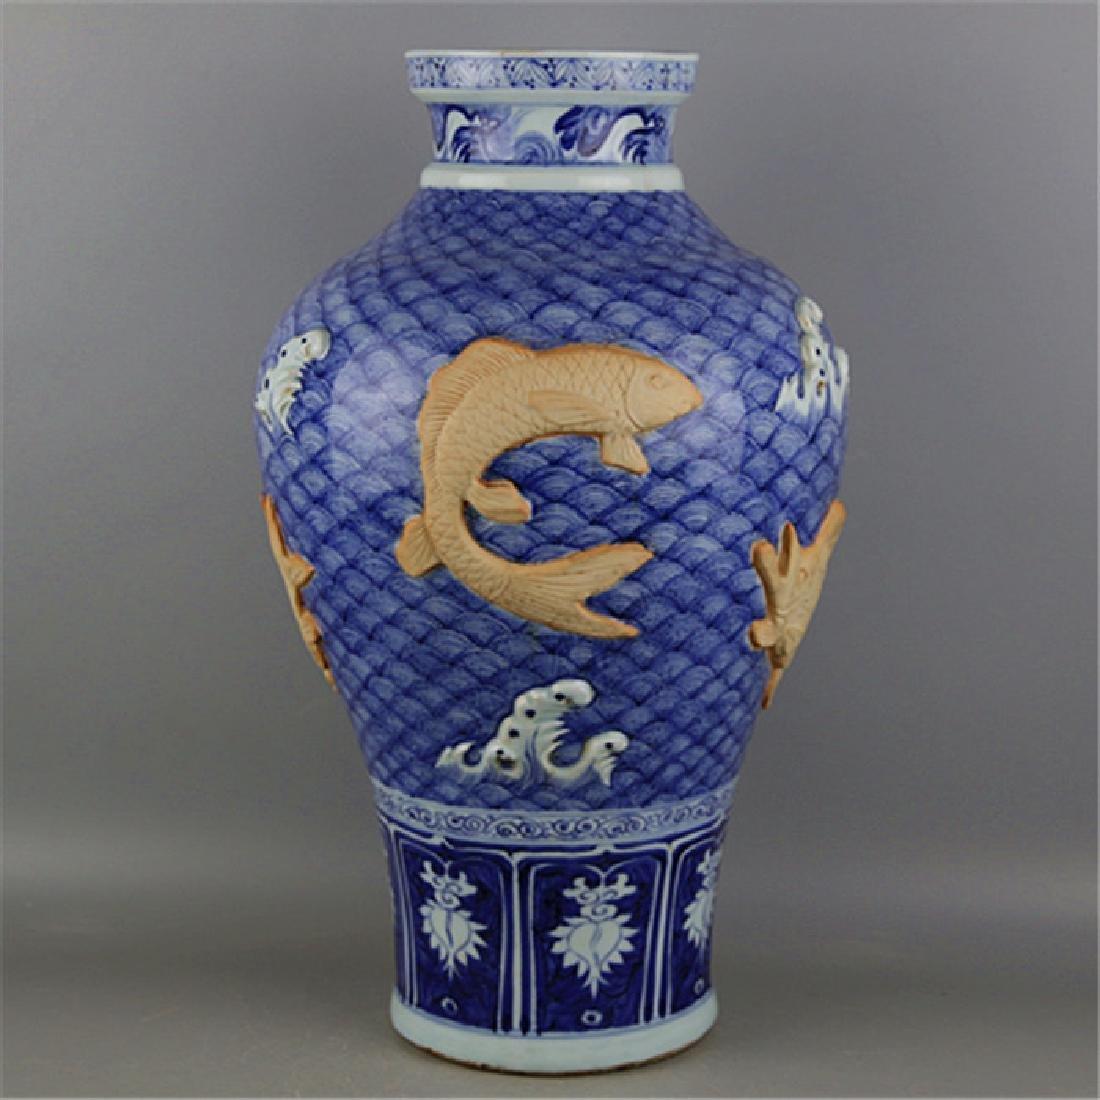 CHINESE PORCELAIN BLUE AND WHITE FISH VASE